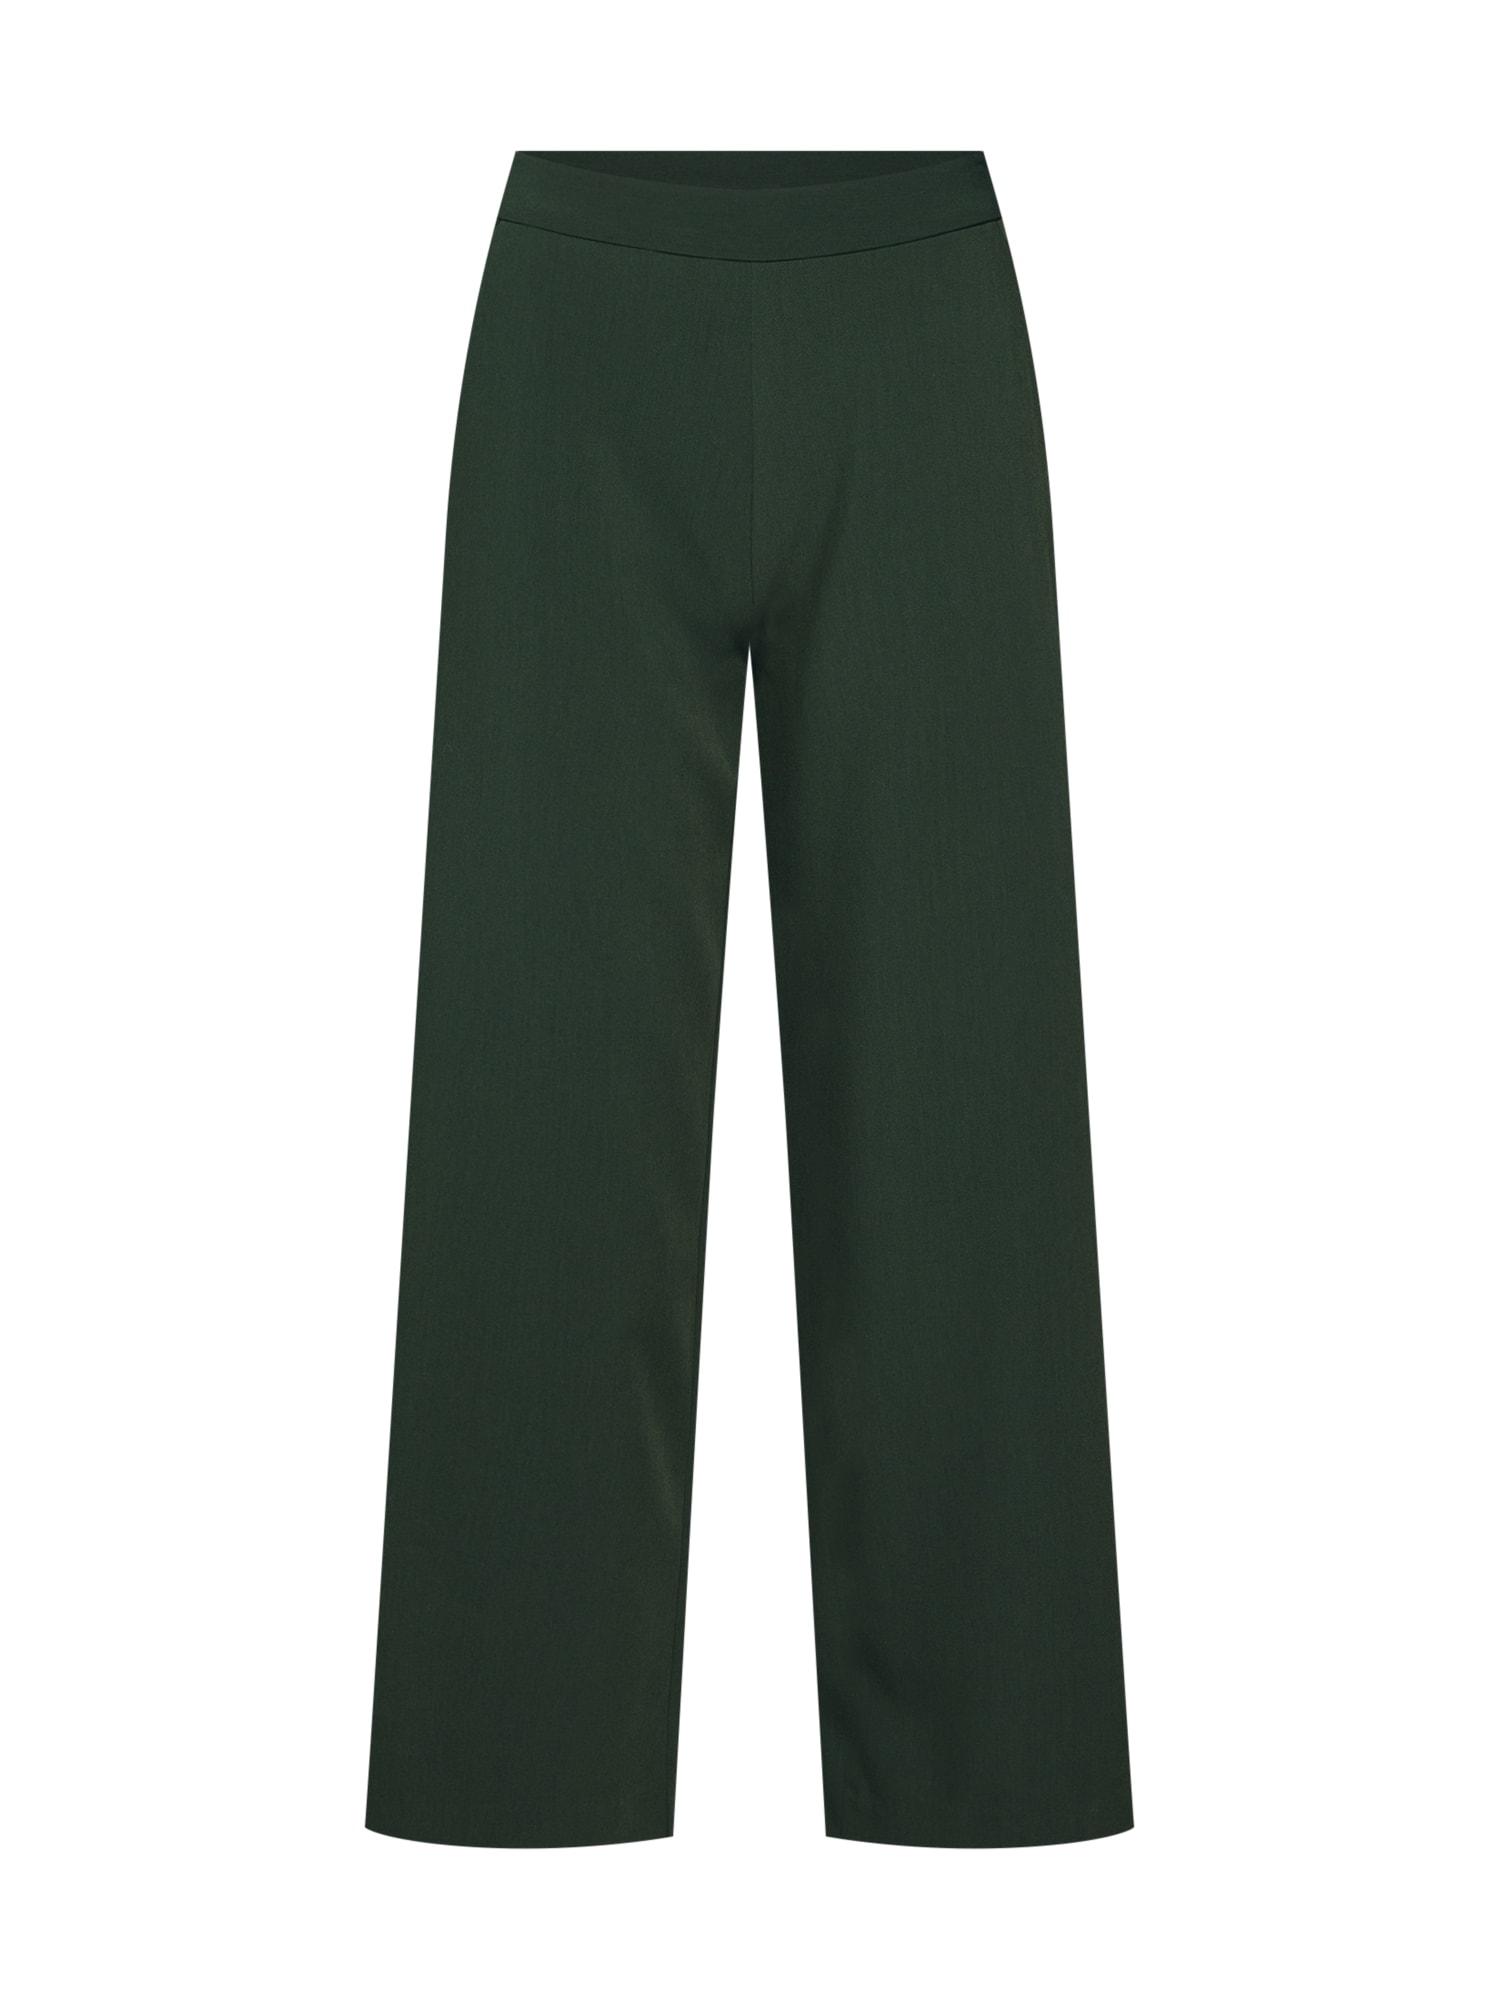 Chino kalhoty Etna khaki JUST FEMALE